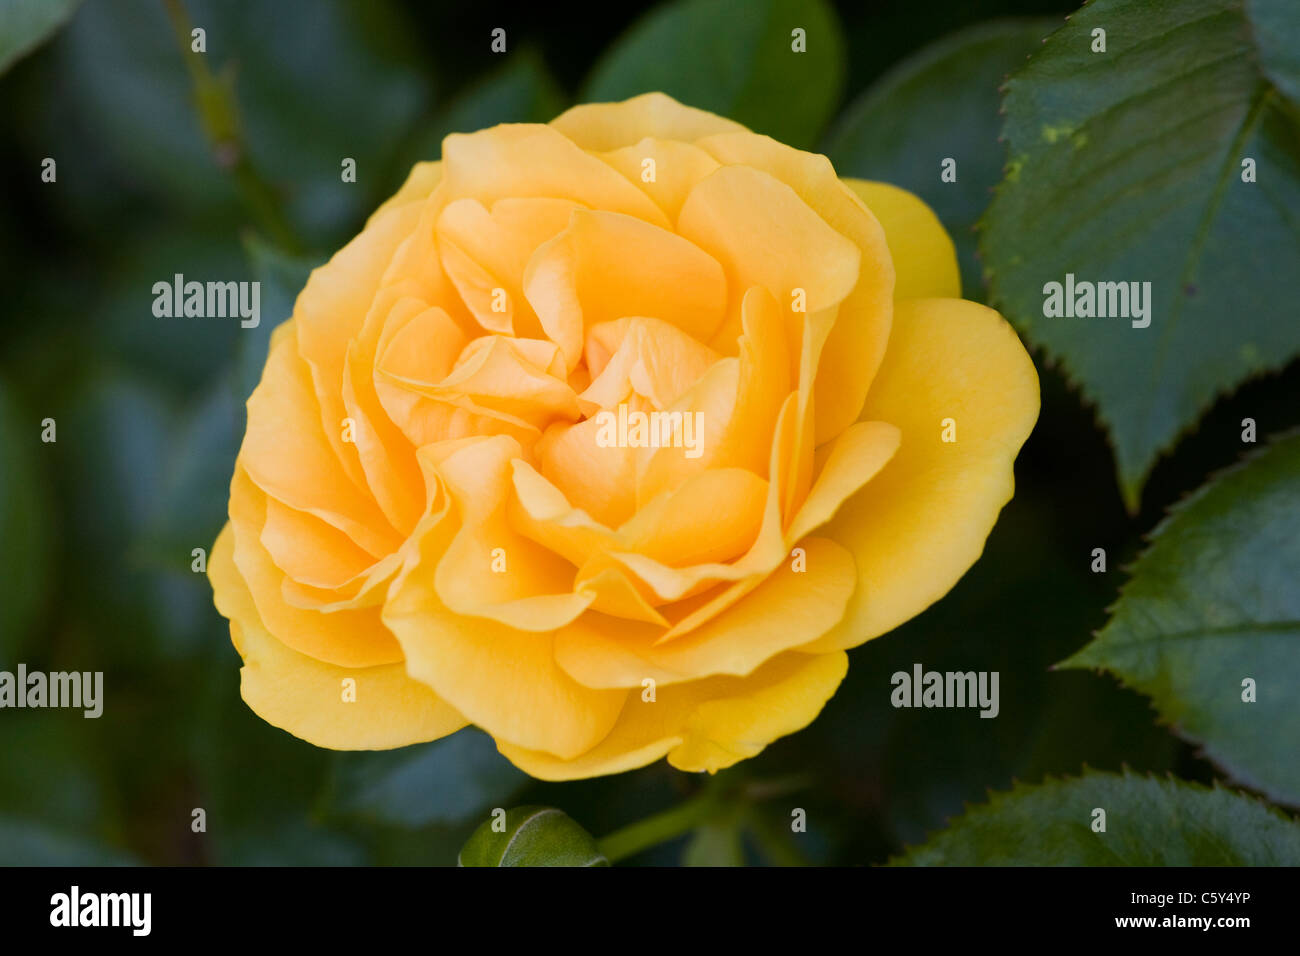 Rosa 'Absolutely Fabulous' (Wekvossutono) . Golden yellow rose in an English garden. - Stock Image